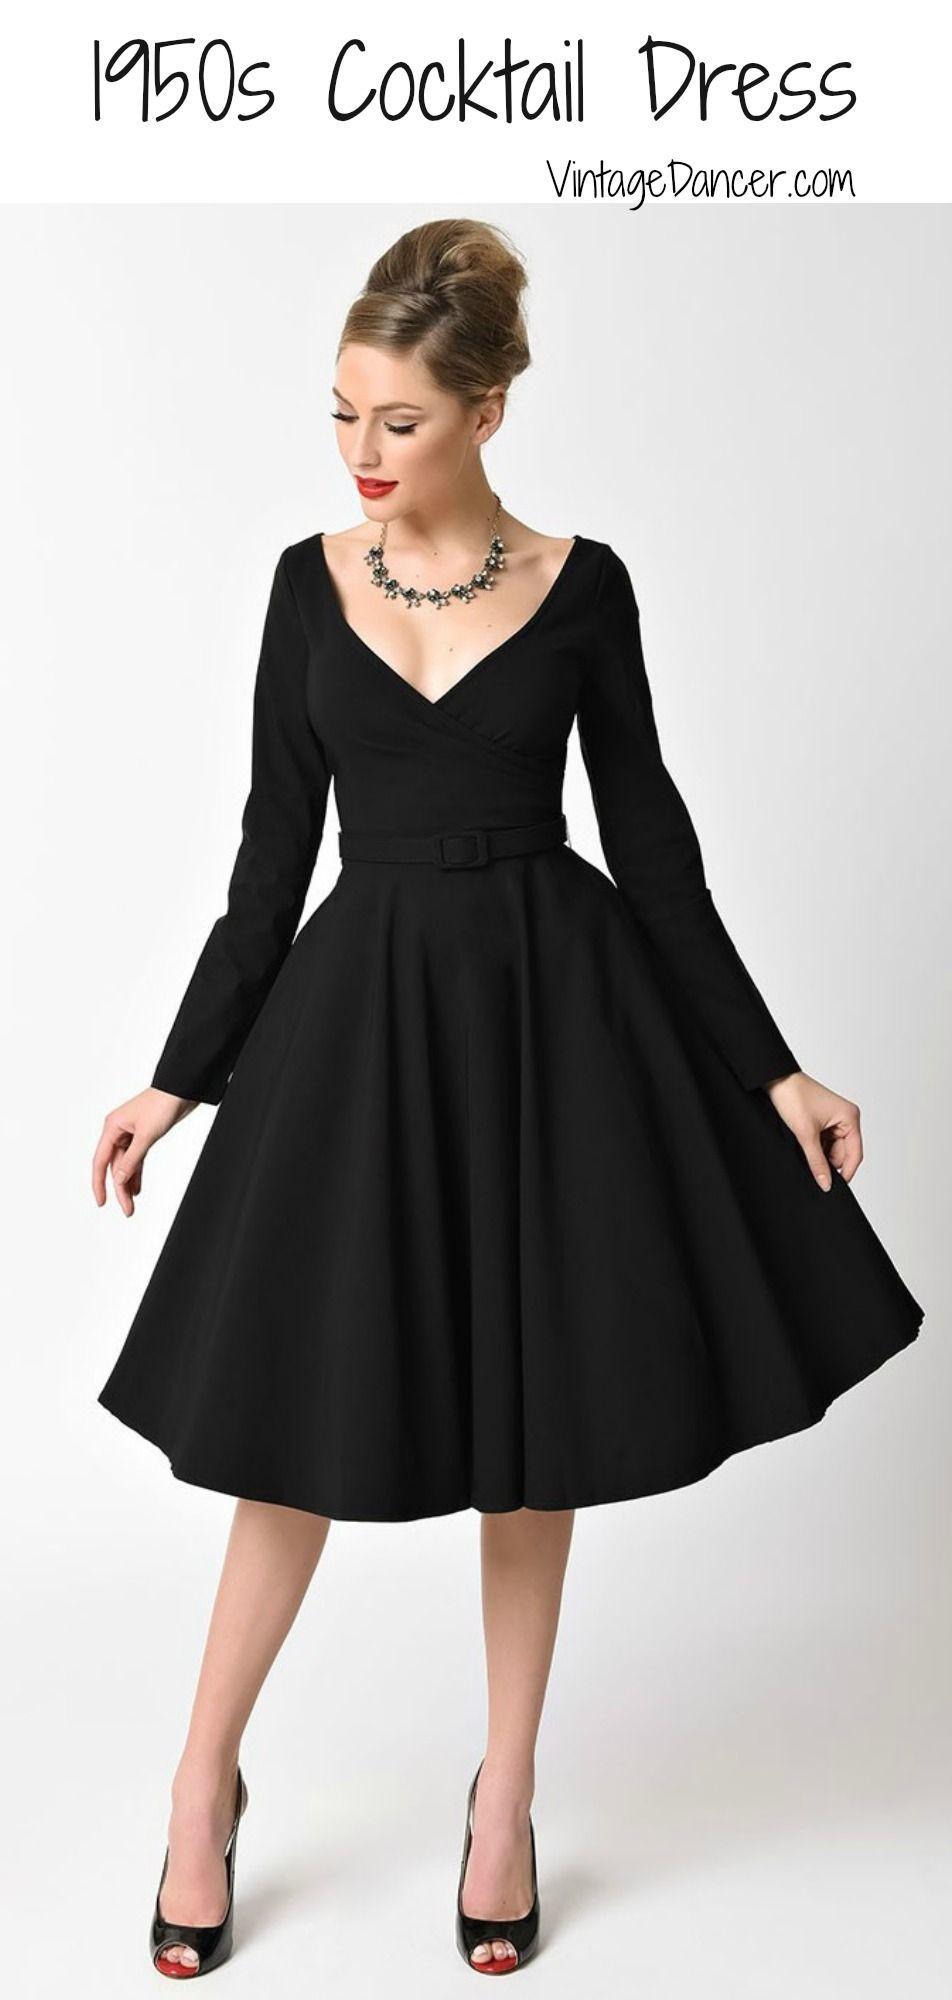 1950s Cocktail Dresses: Party Dresses | Pinterest | Kleidung und Kleider